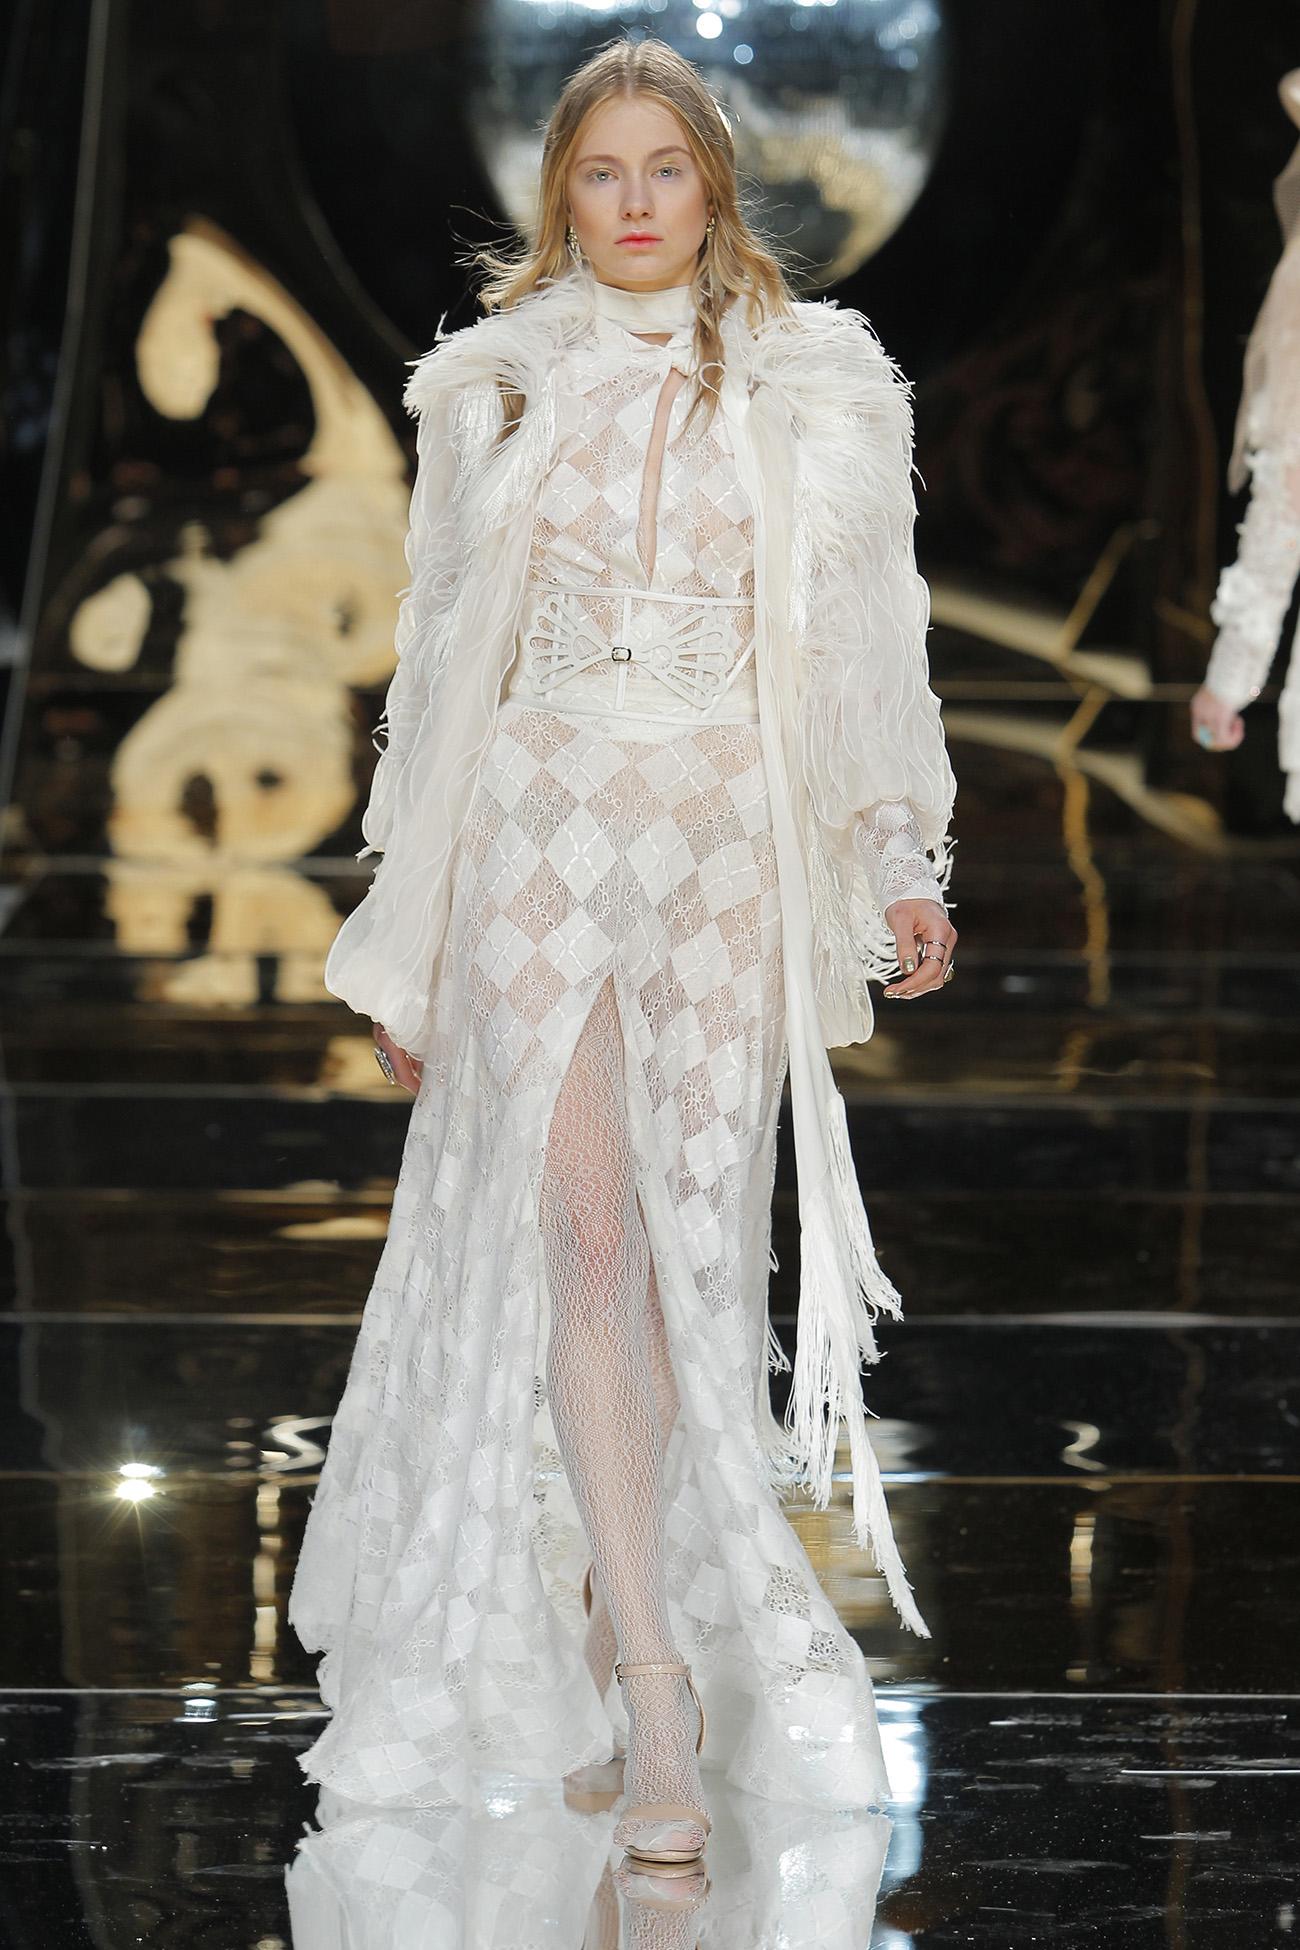 70s inspired wedding dresses from Yolan Cris